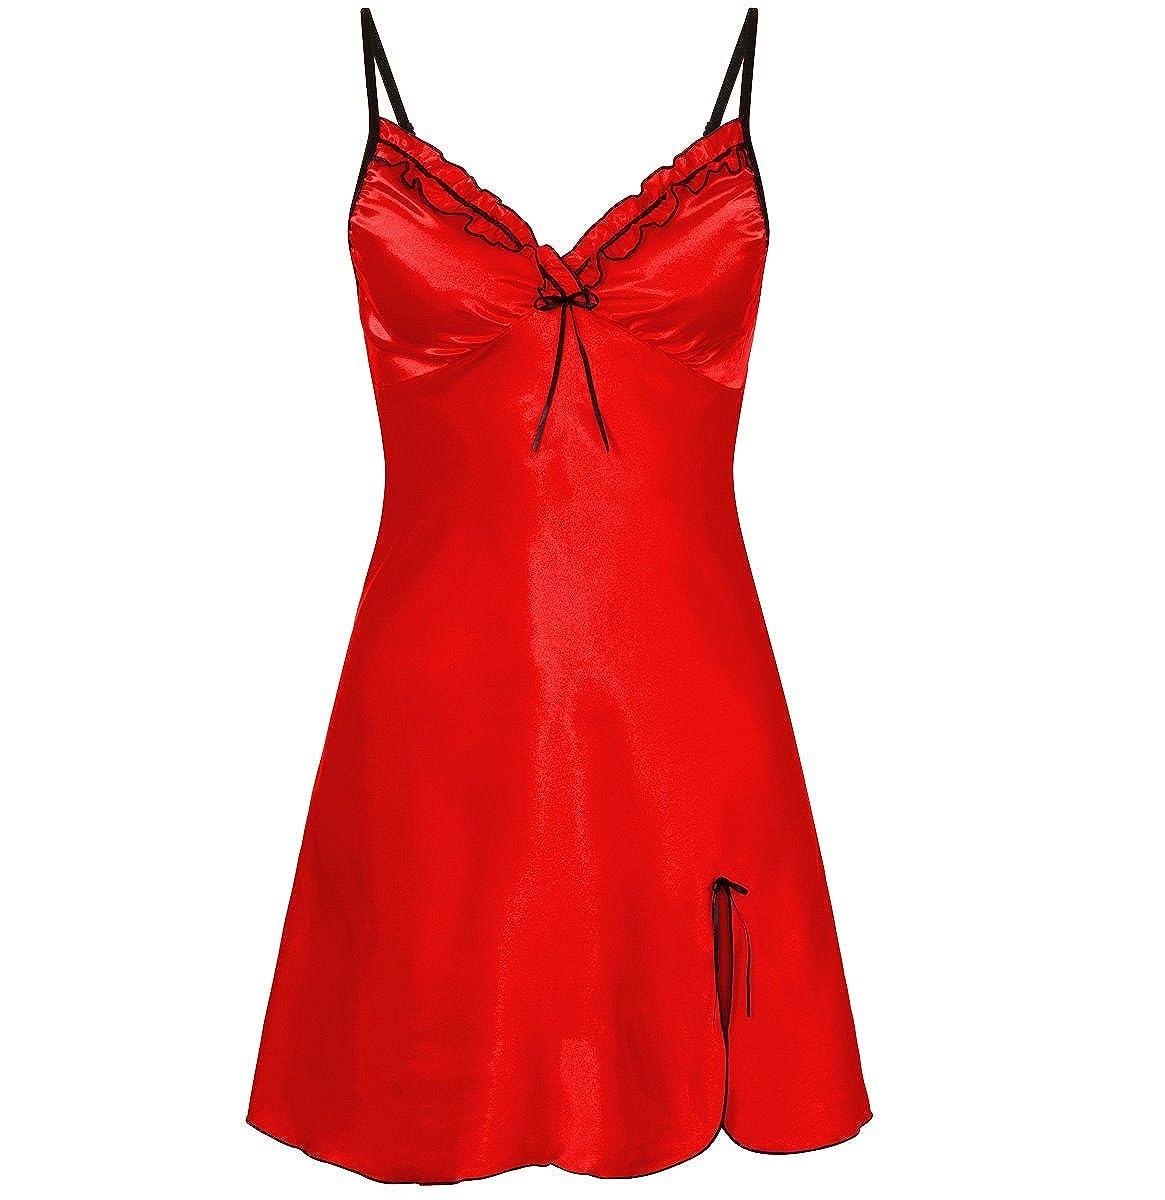 Nine X Satin Babydoll Plus Size Chemise 10-24, Lingerie, Sleepwear